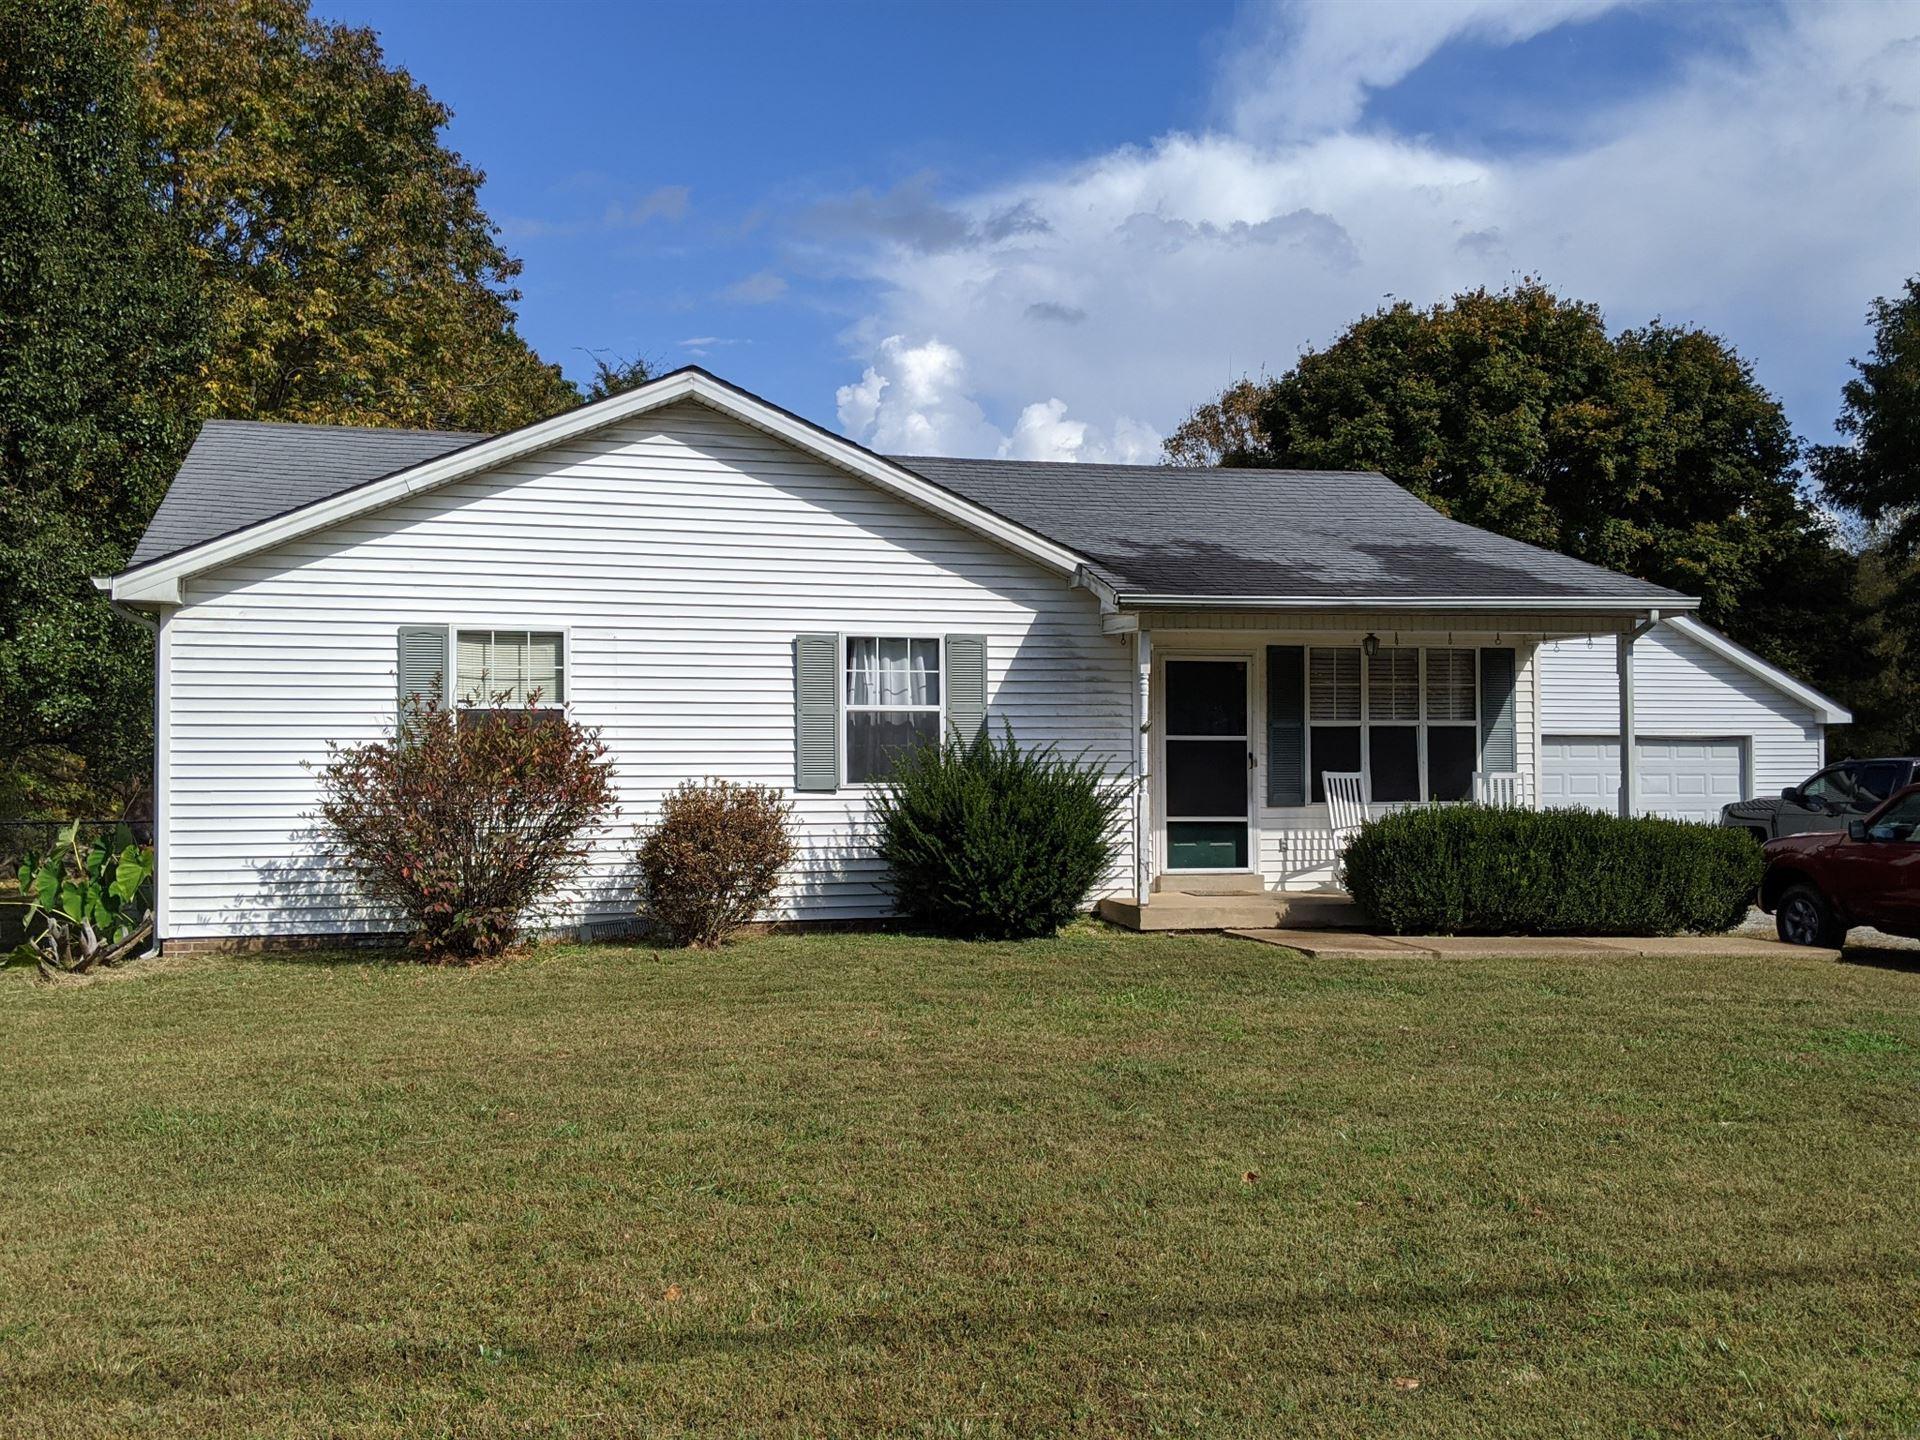 2033 Wolfe Rd, White Bluff, TN 37187 - MLS#: 2201088